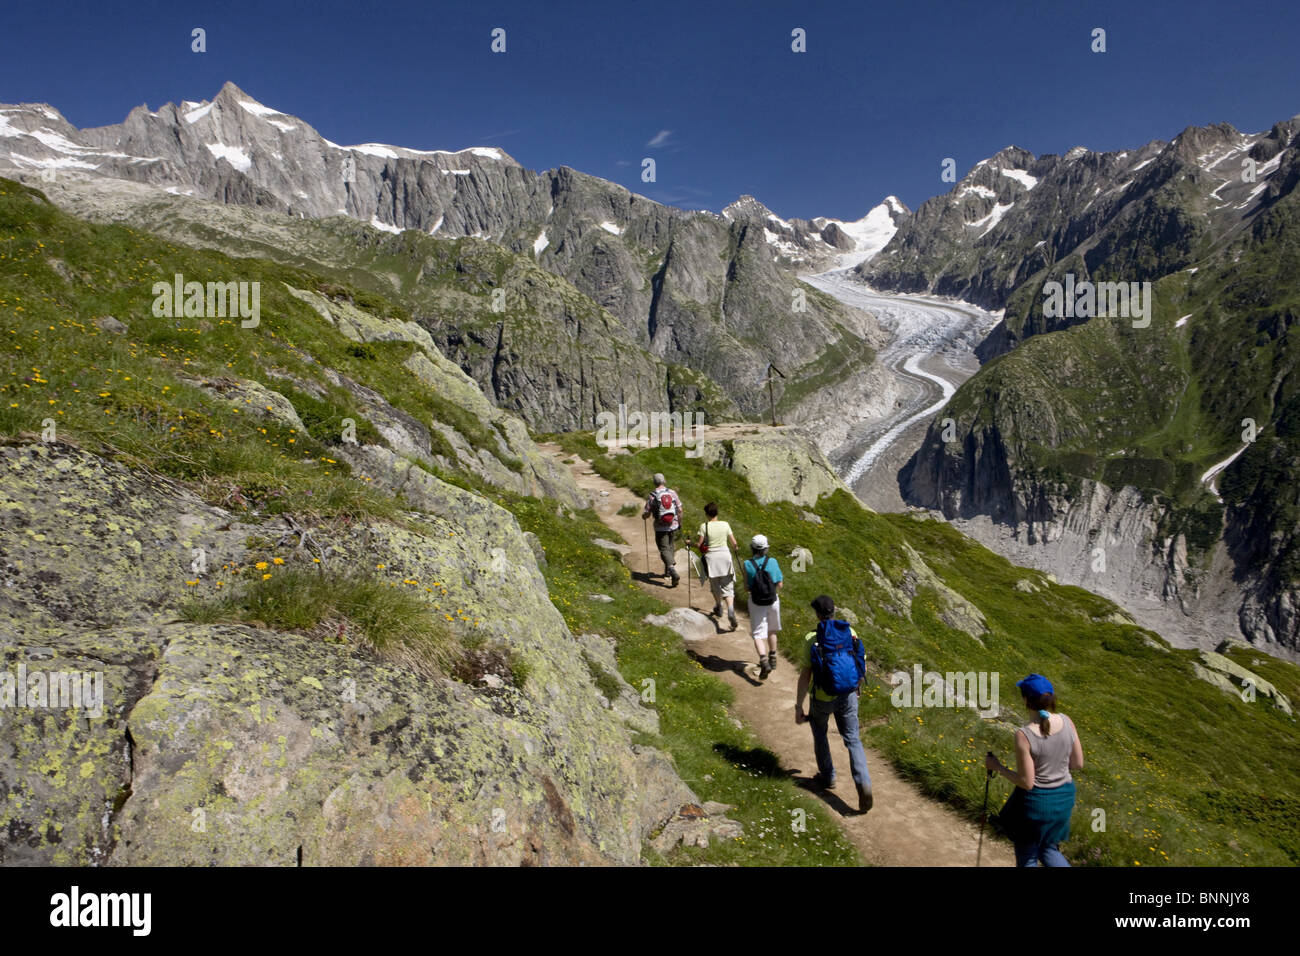 Switzerland swiss walk hike group five persons footpath scenery nature Fieschergletscher Alpine roses mountains - Stock Image